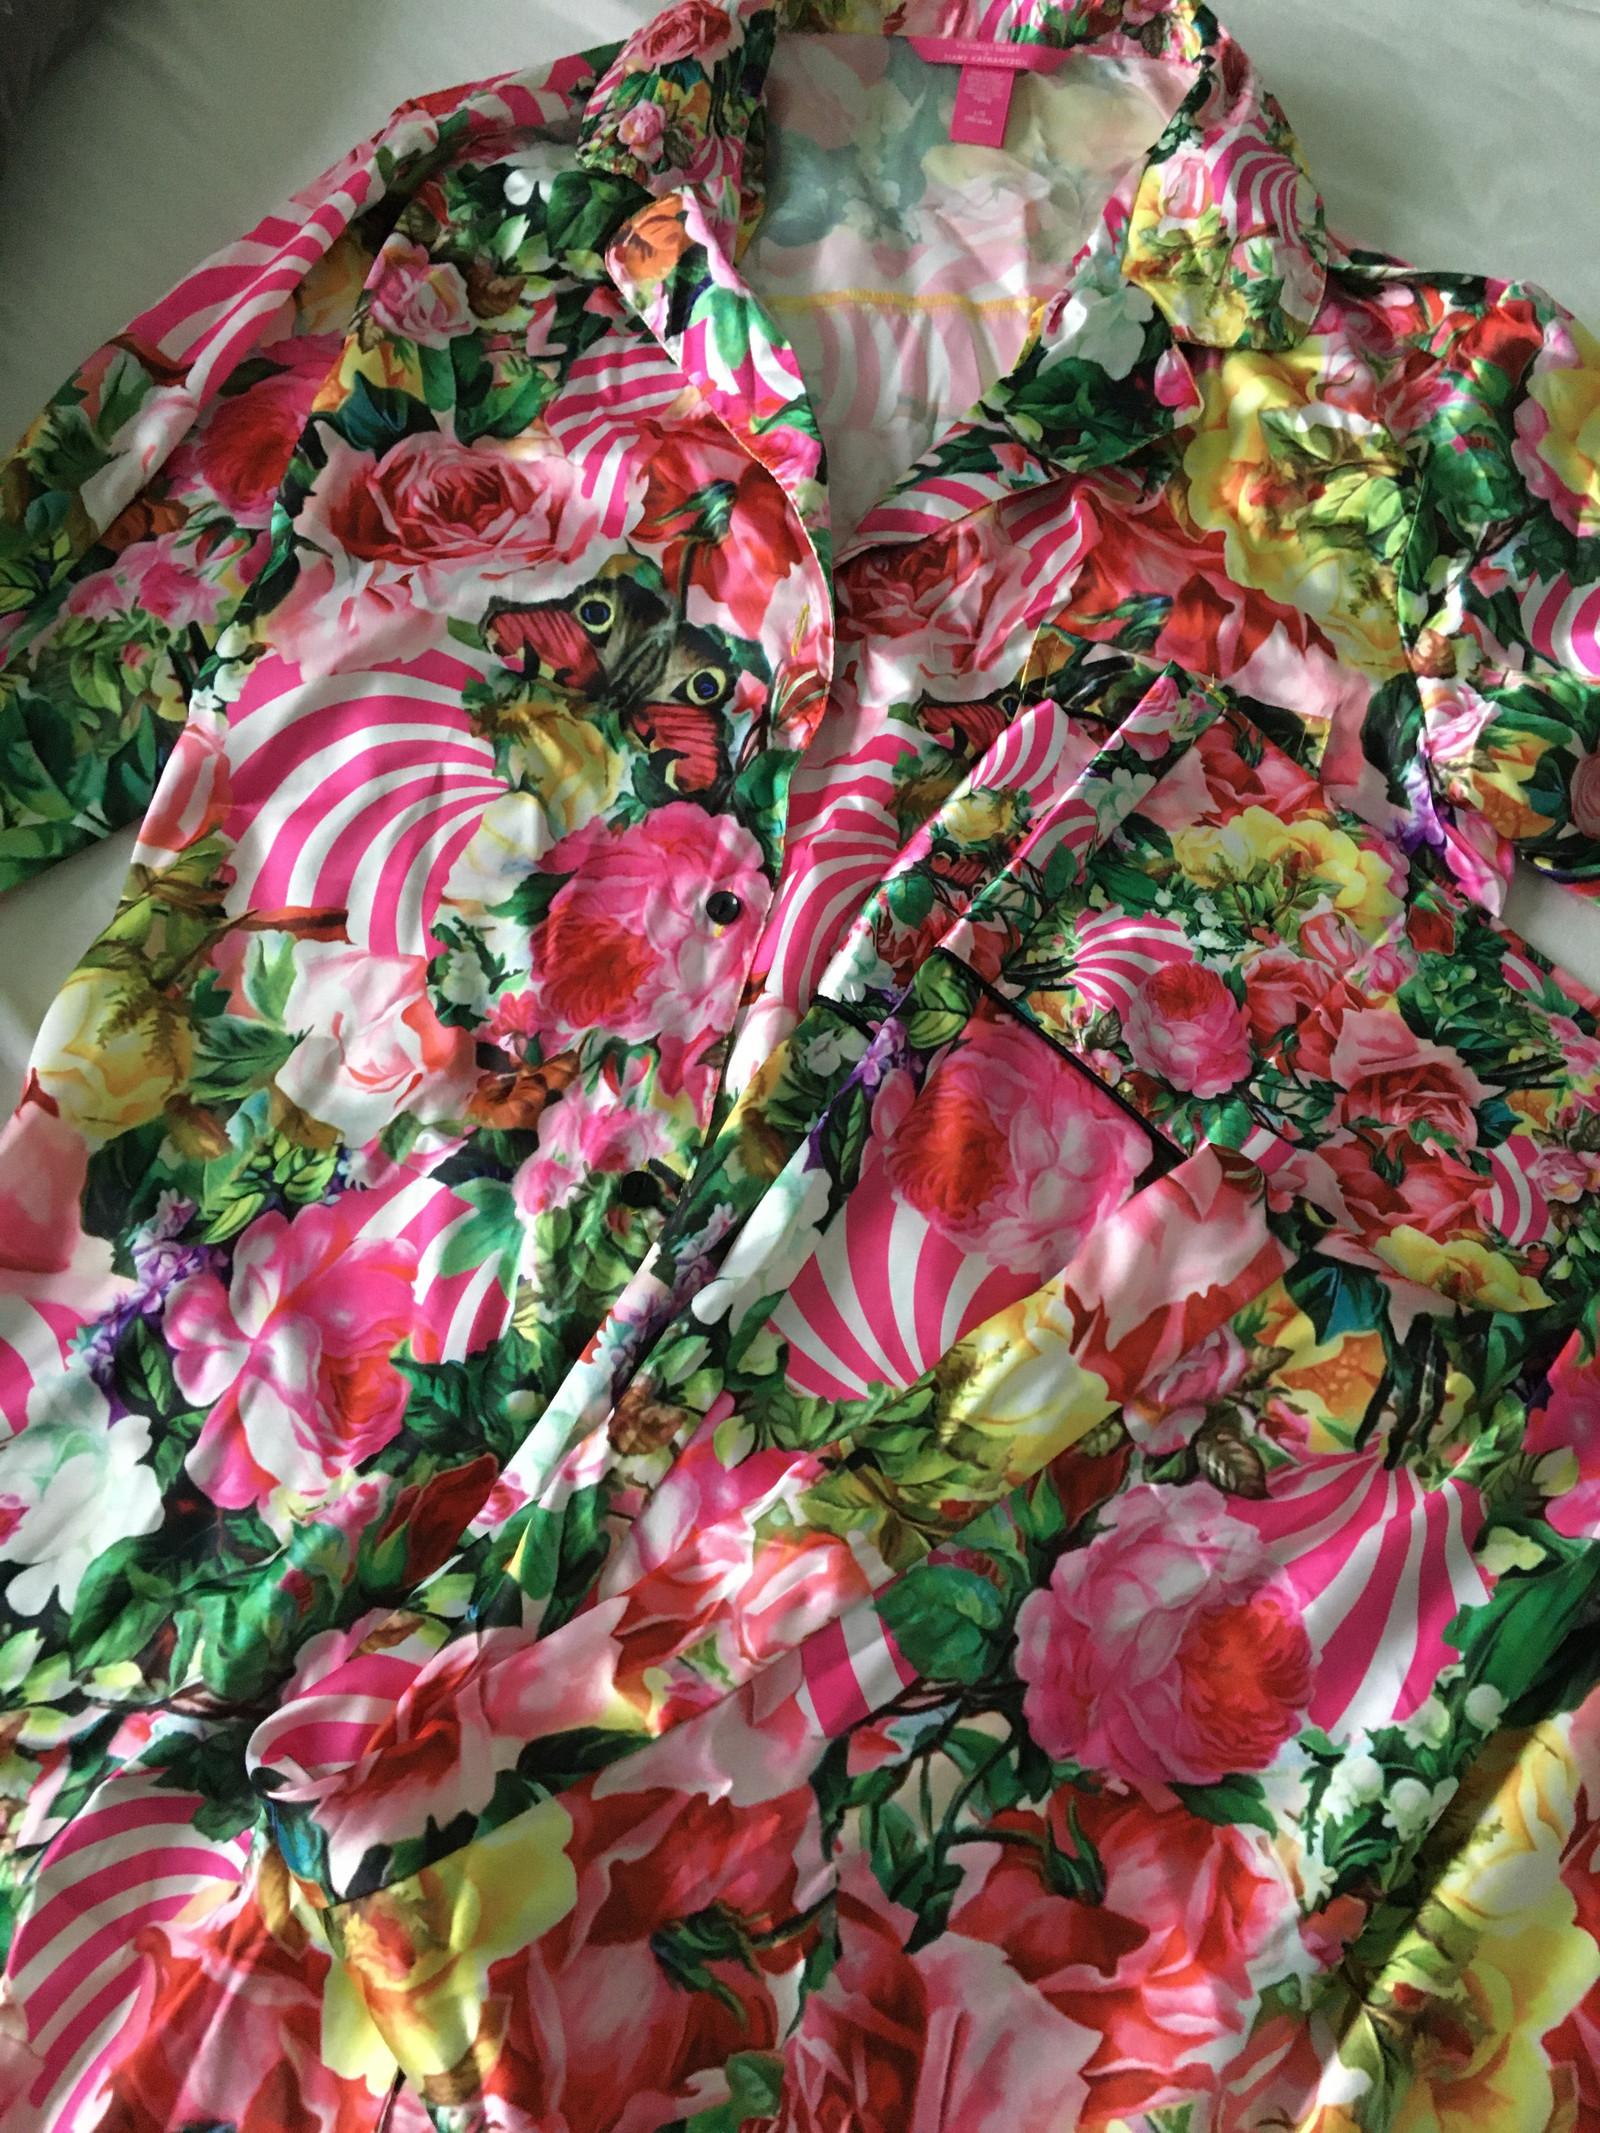 Victoria's secret silkepyjamas   FINN.no